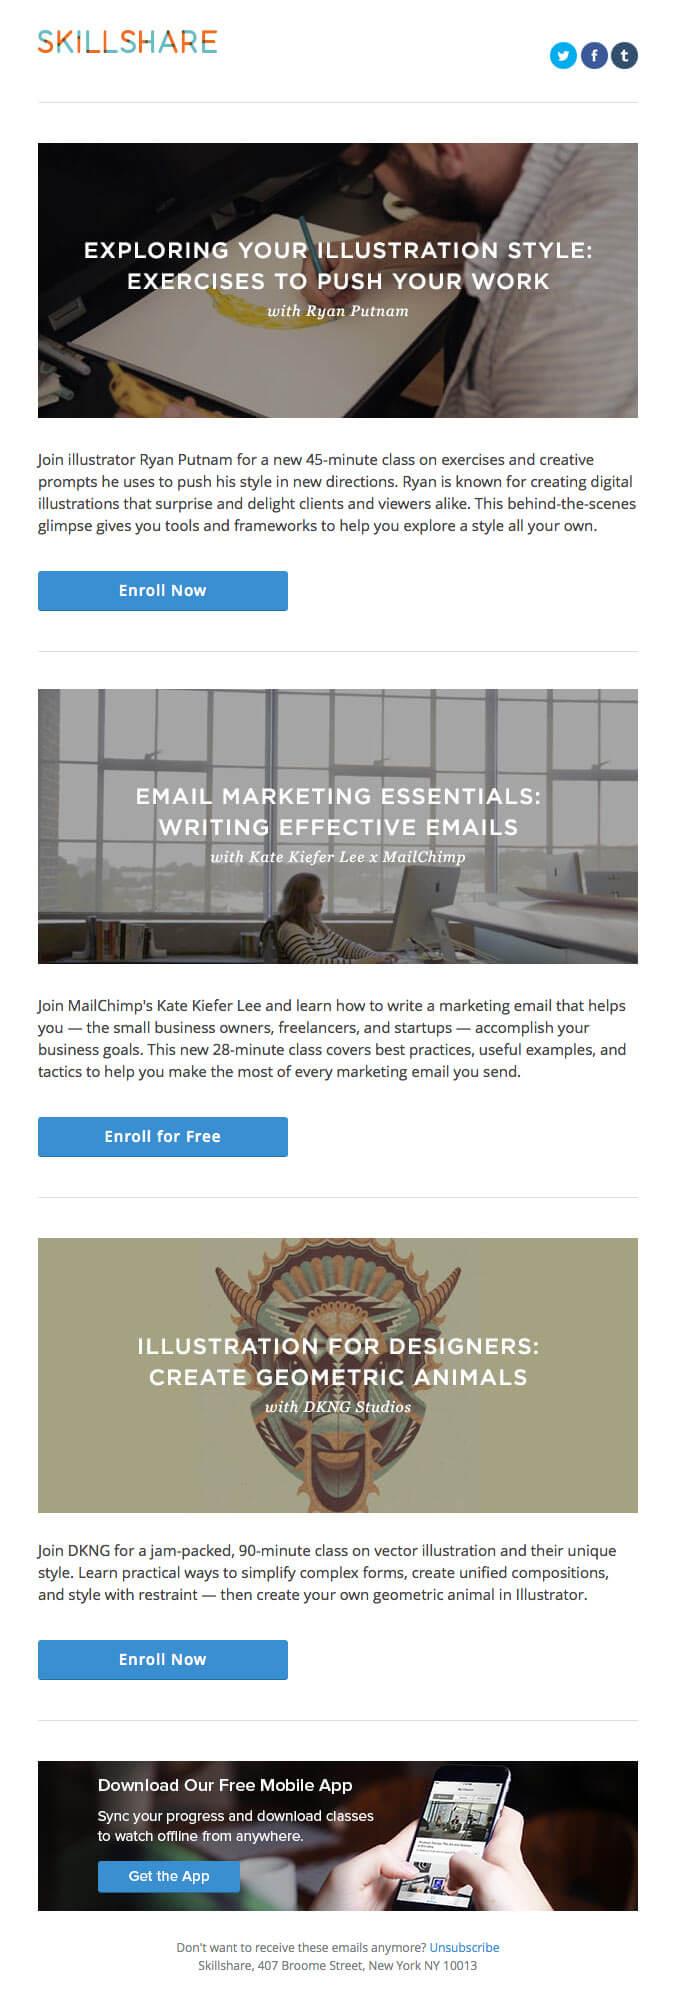 Academic-email-inspiration-Skillshare